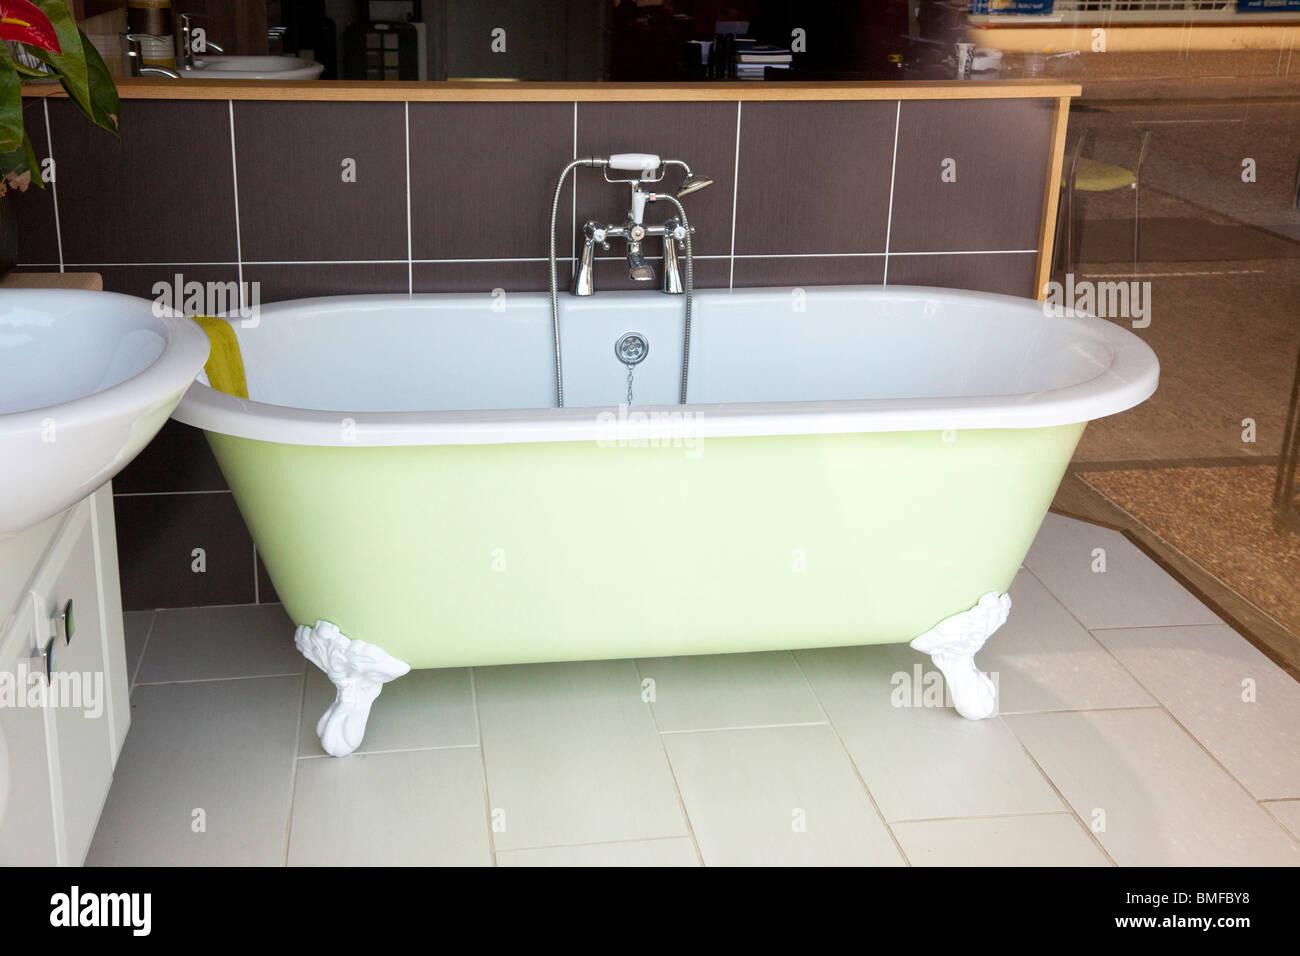 bath in a bathroom shop showroom - Stock Image